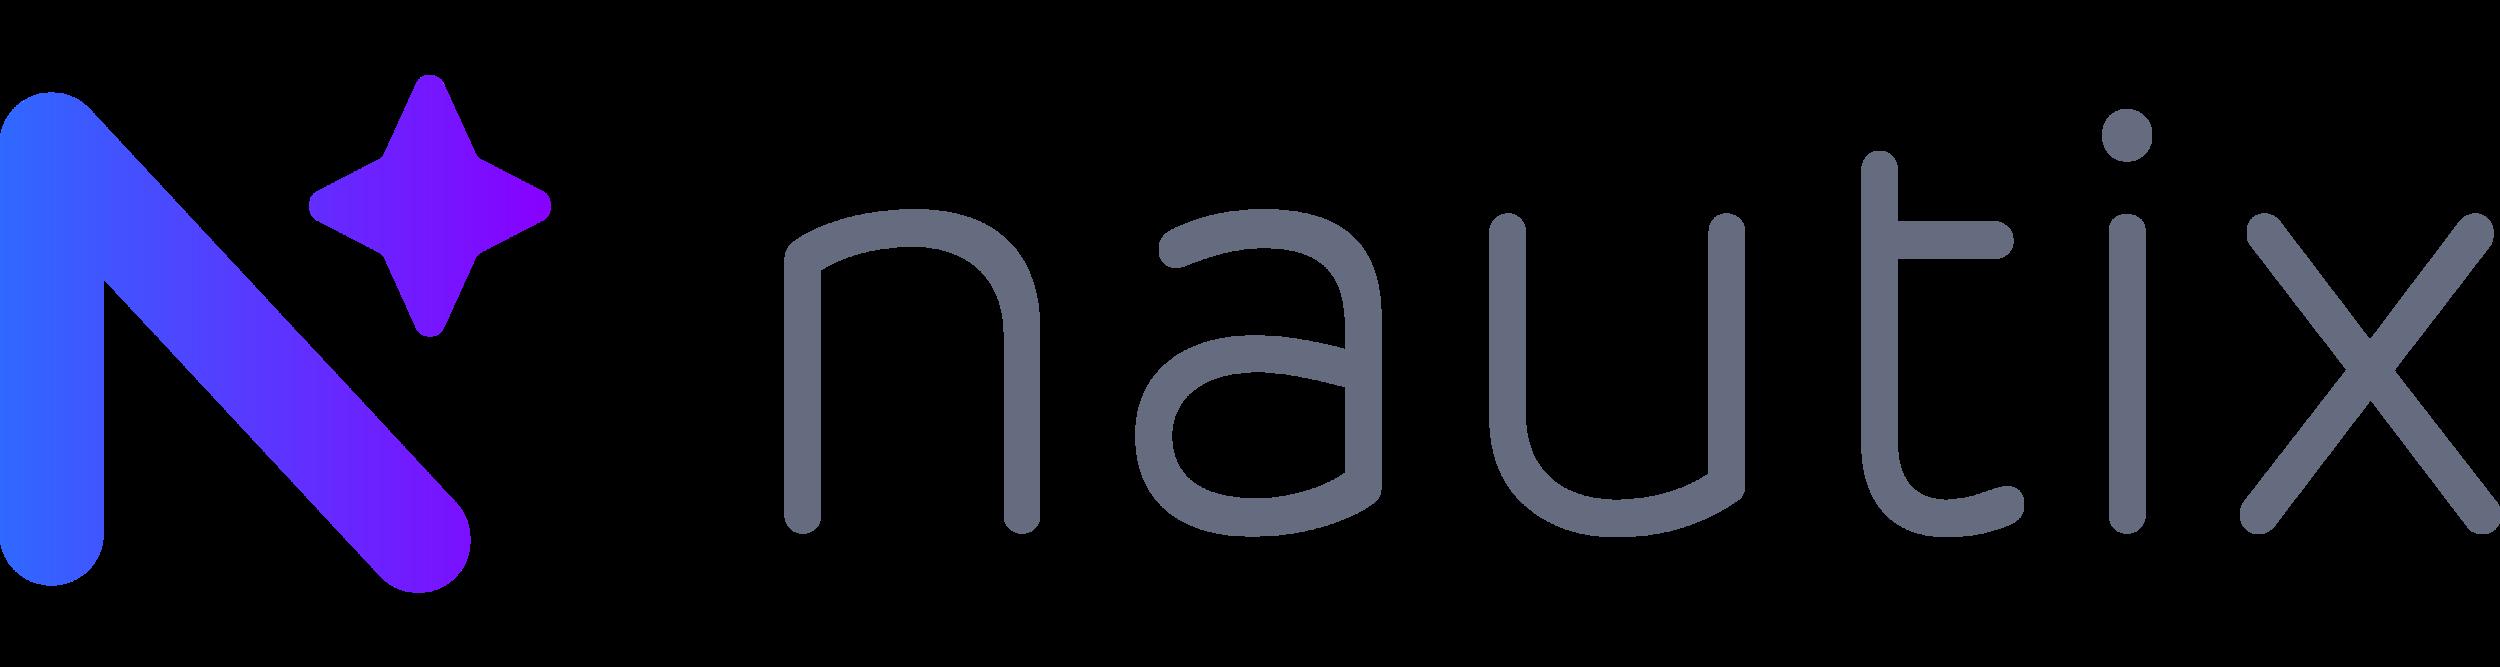 Nautix Technologies IVS